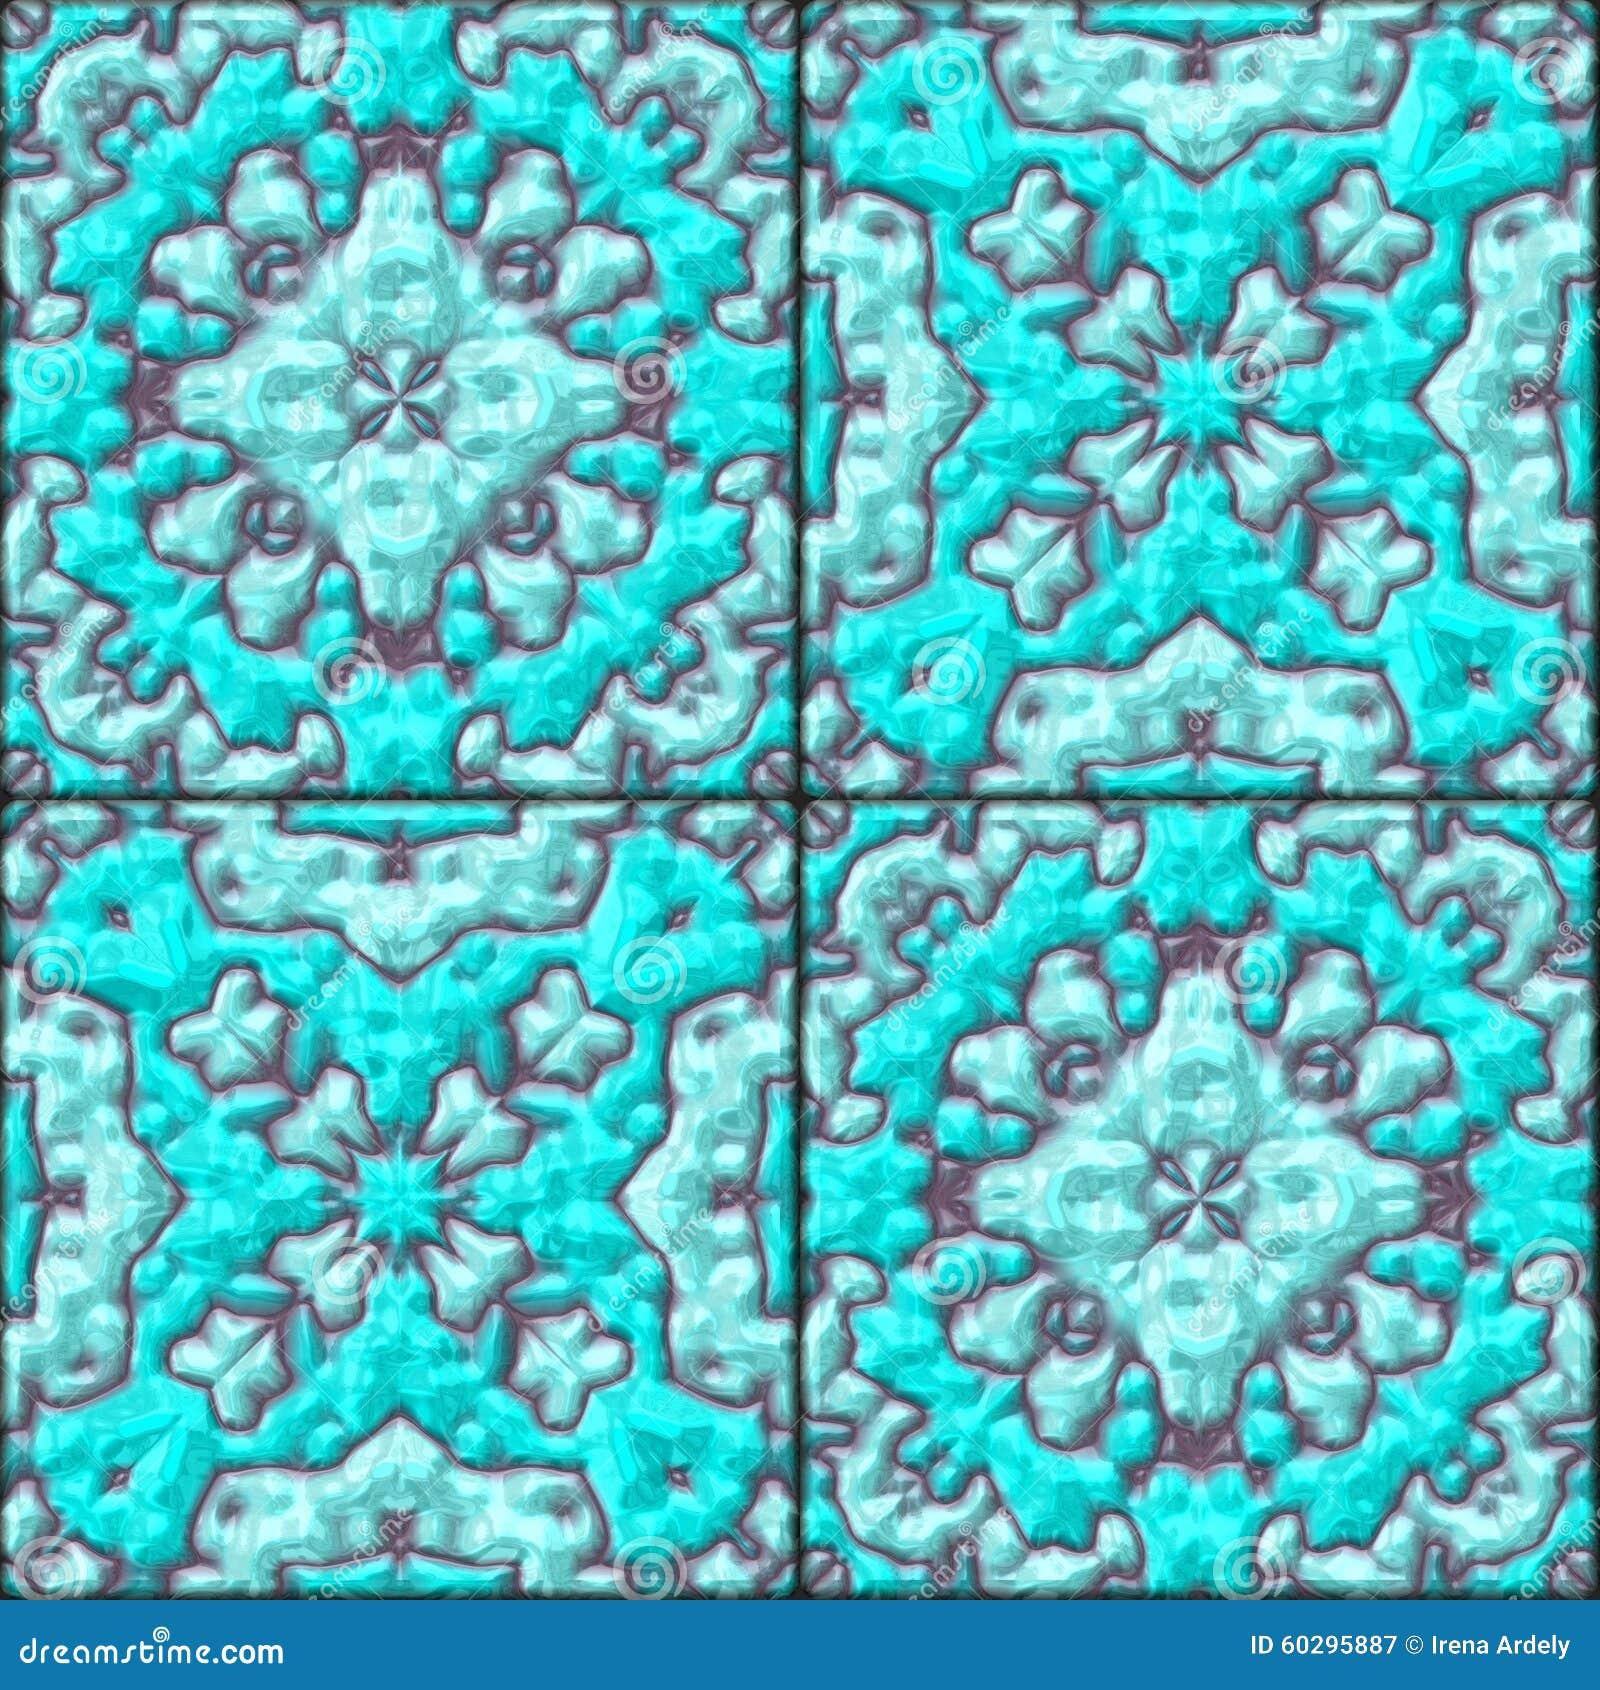 Bathroom Floor Plans Free Turquoise Blue Floral Ceramic Tiles Seamless Pattern